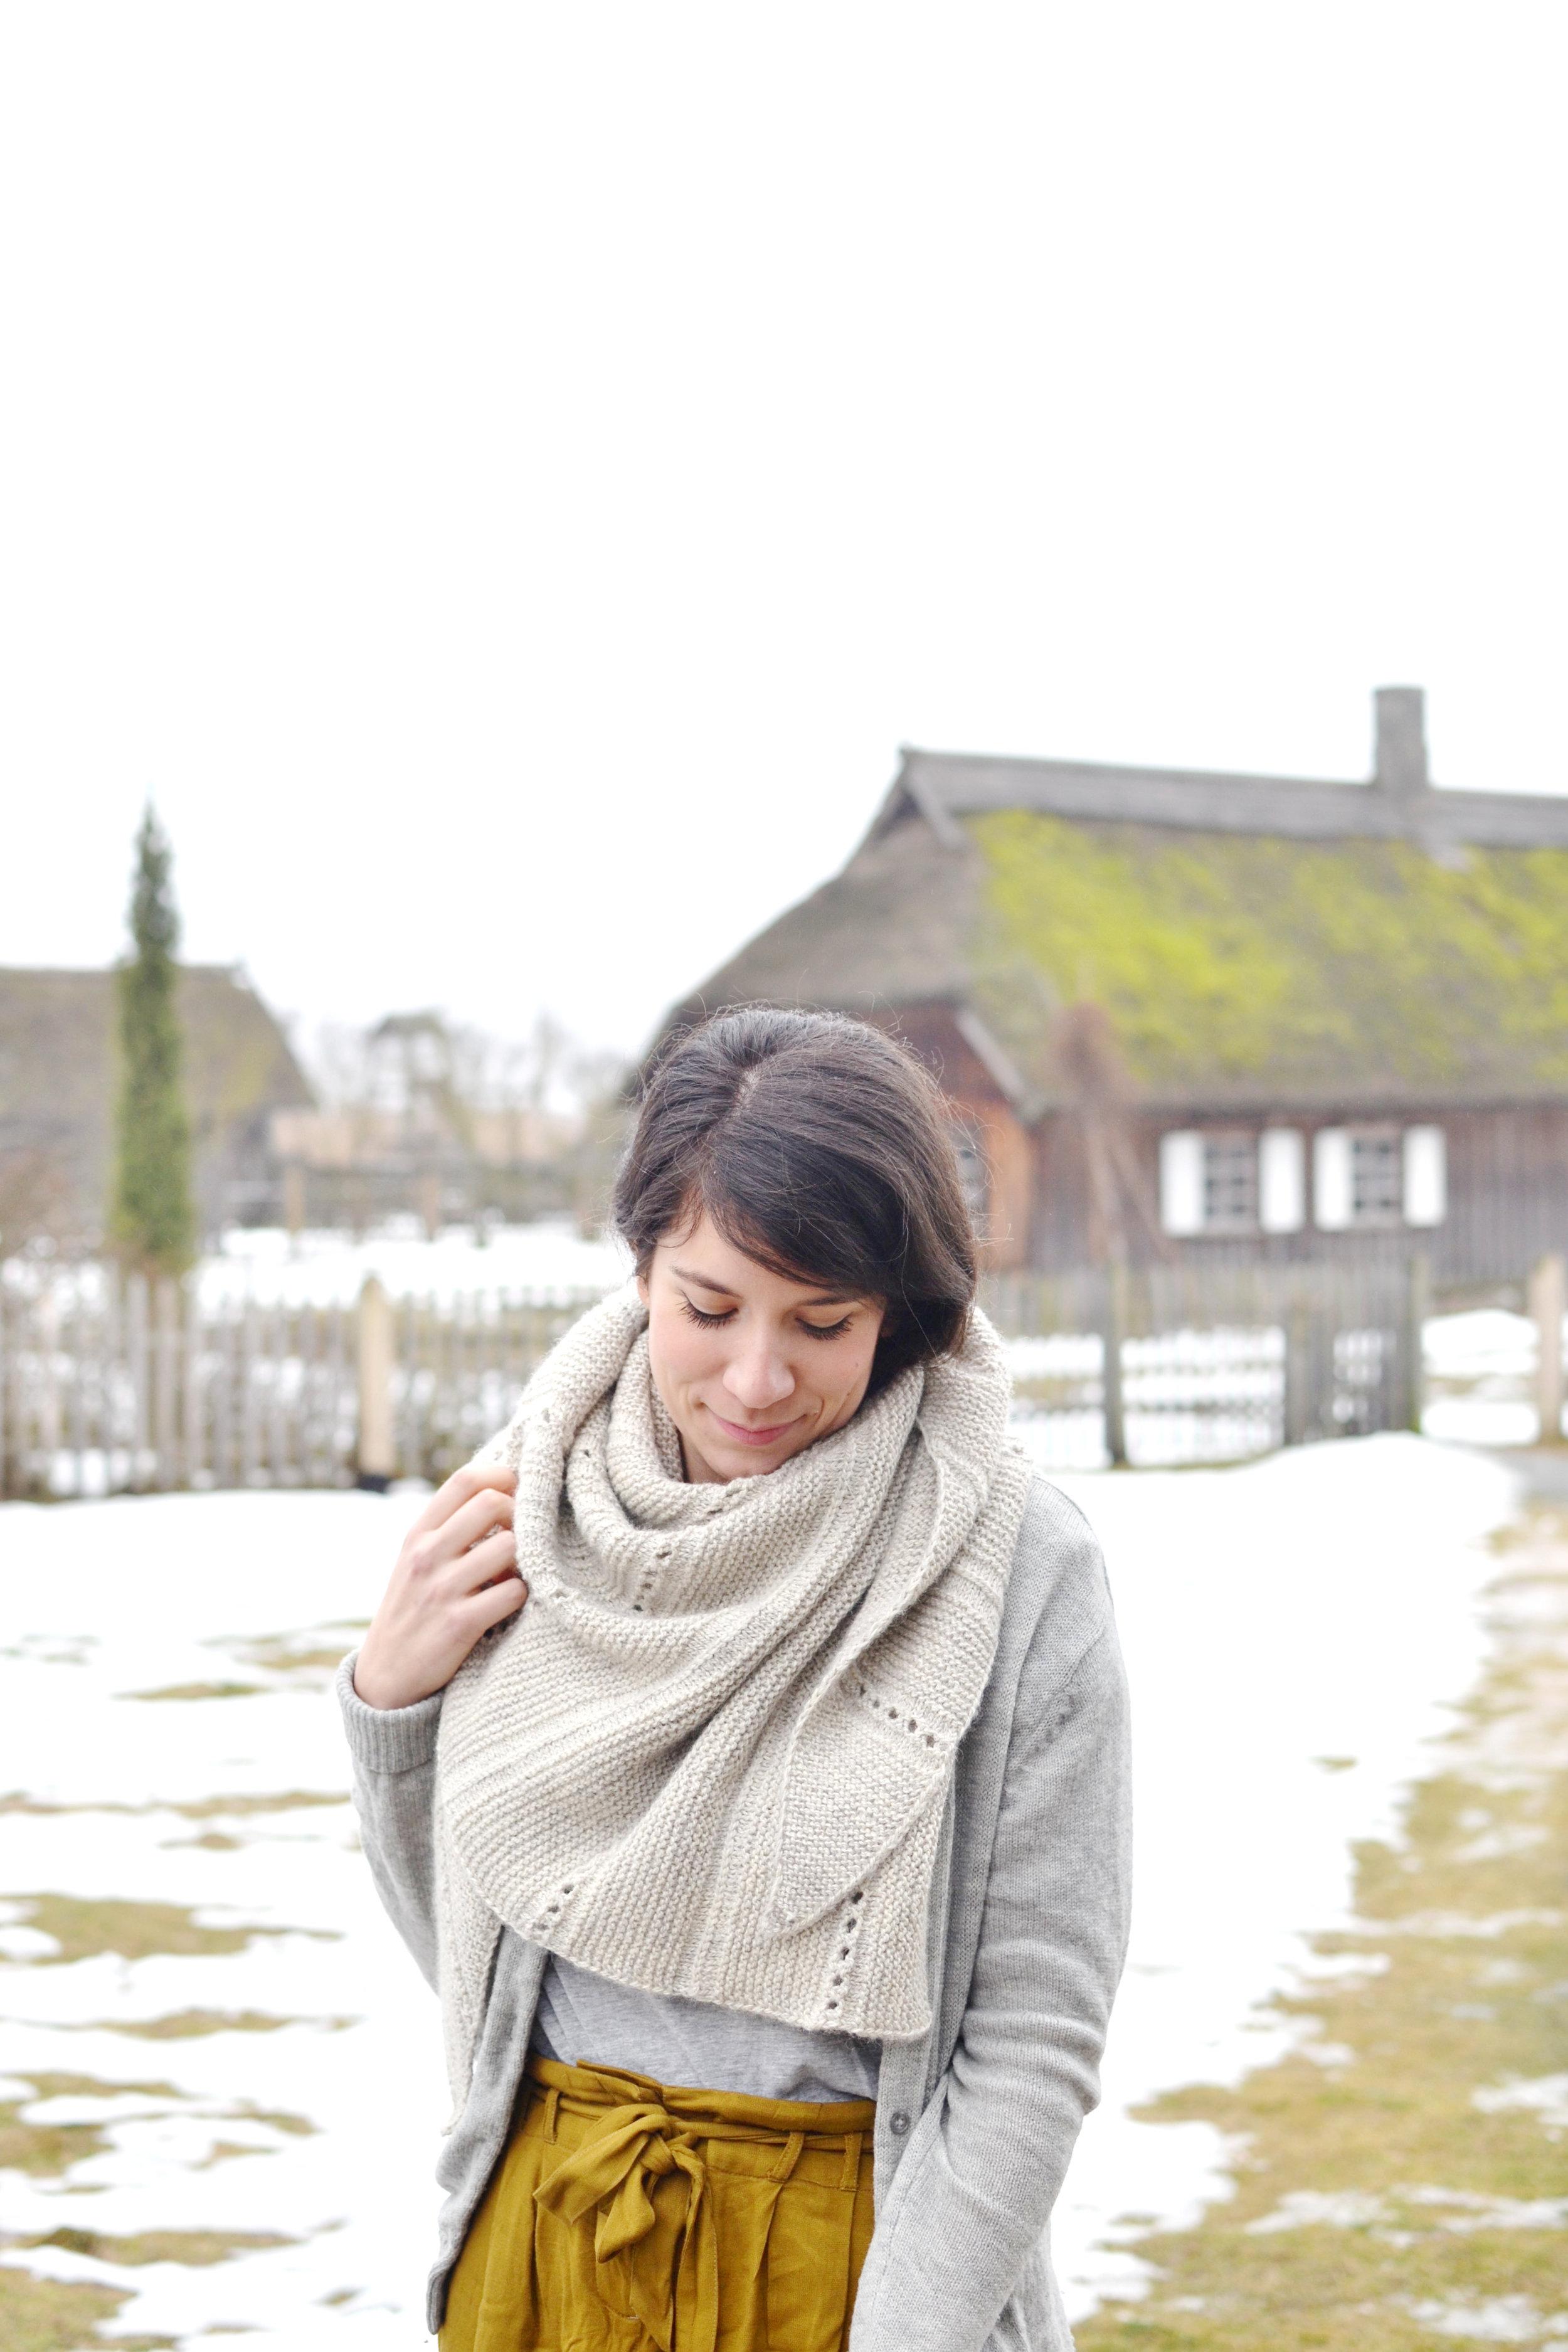 Homestead shawl